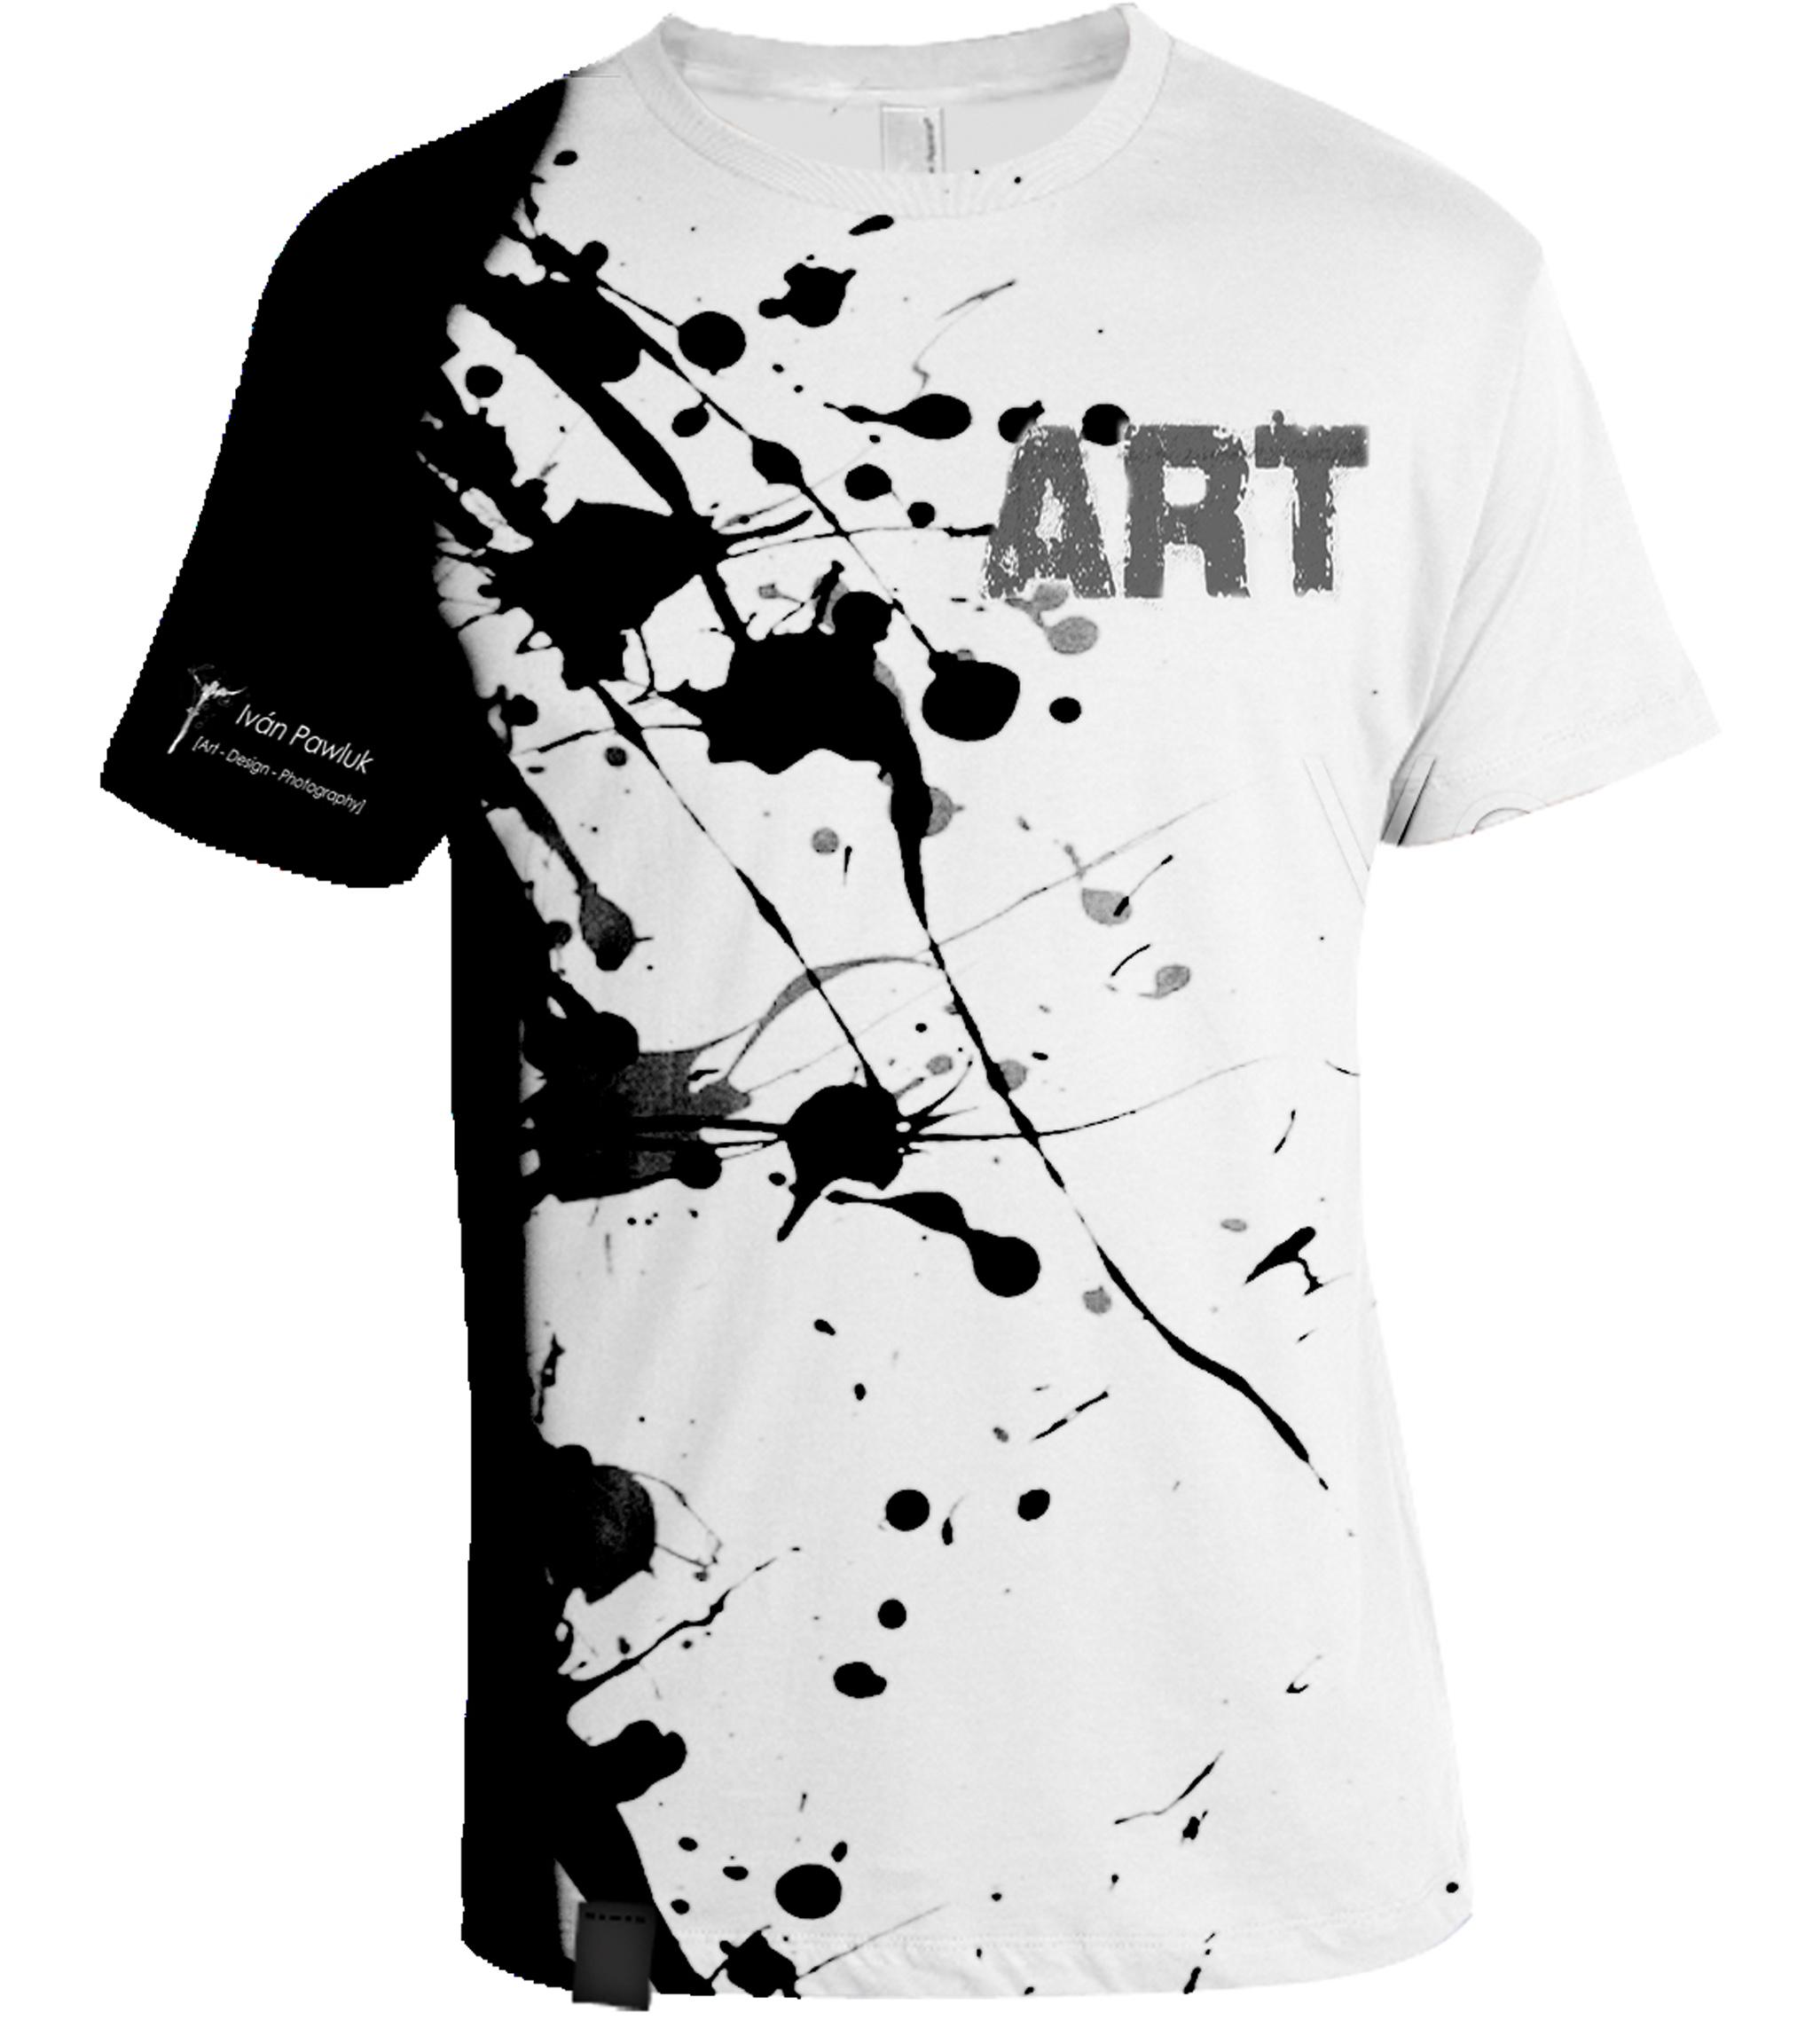 Scribble Drawing T Shirt : Visual art t shirt by iván pawluk arq design todo